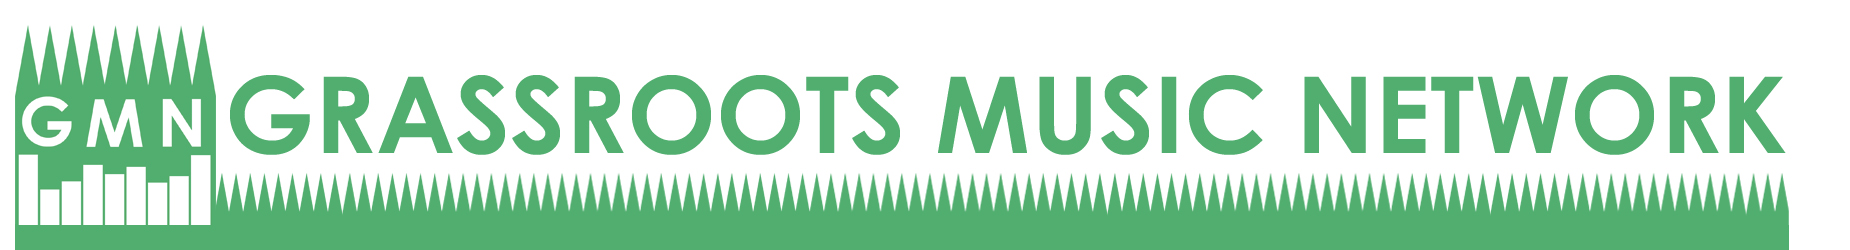 Grassroots Music Network Logo